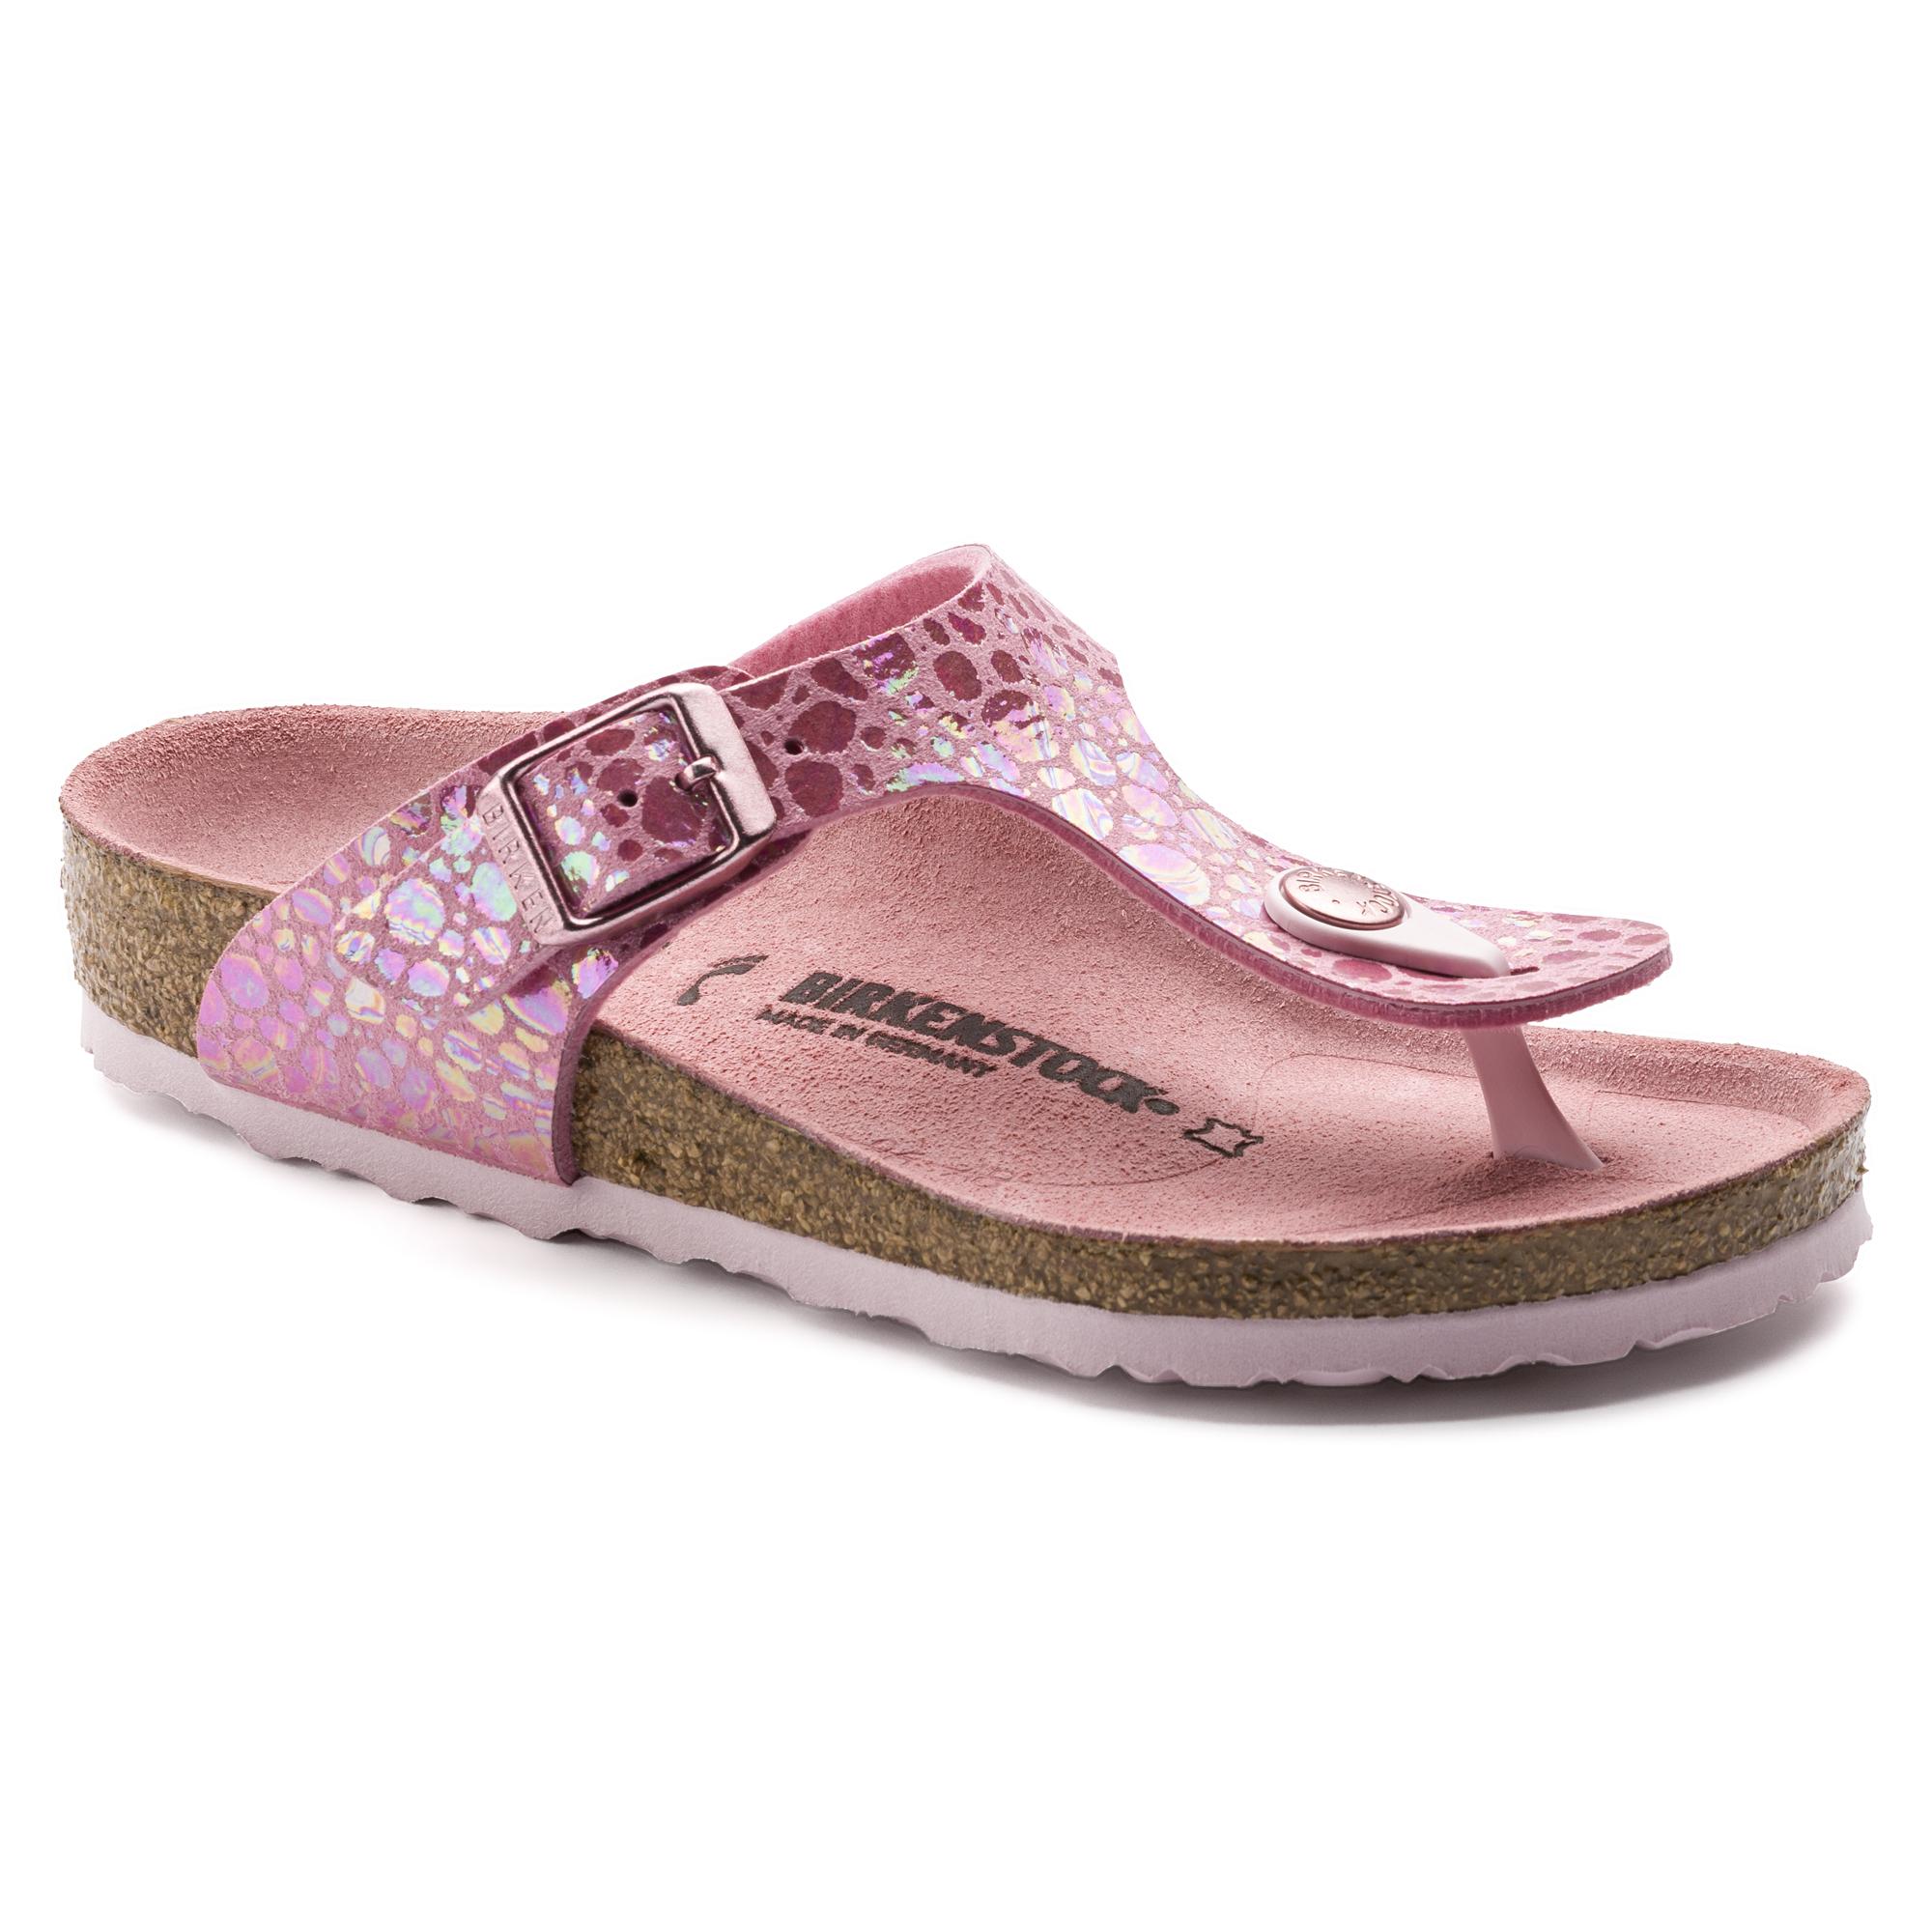 89a09df83f2 Gizeh Micro Fibre Metallic Stones Pink